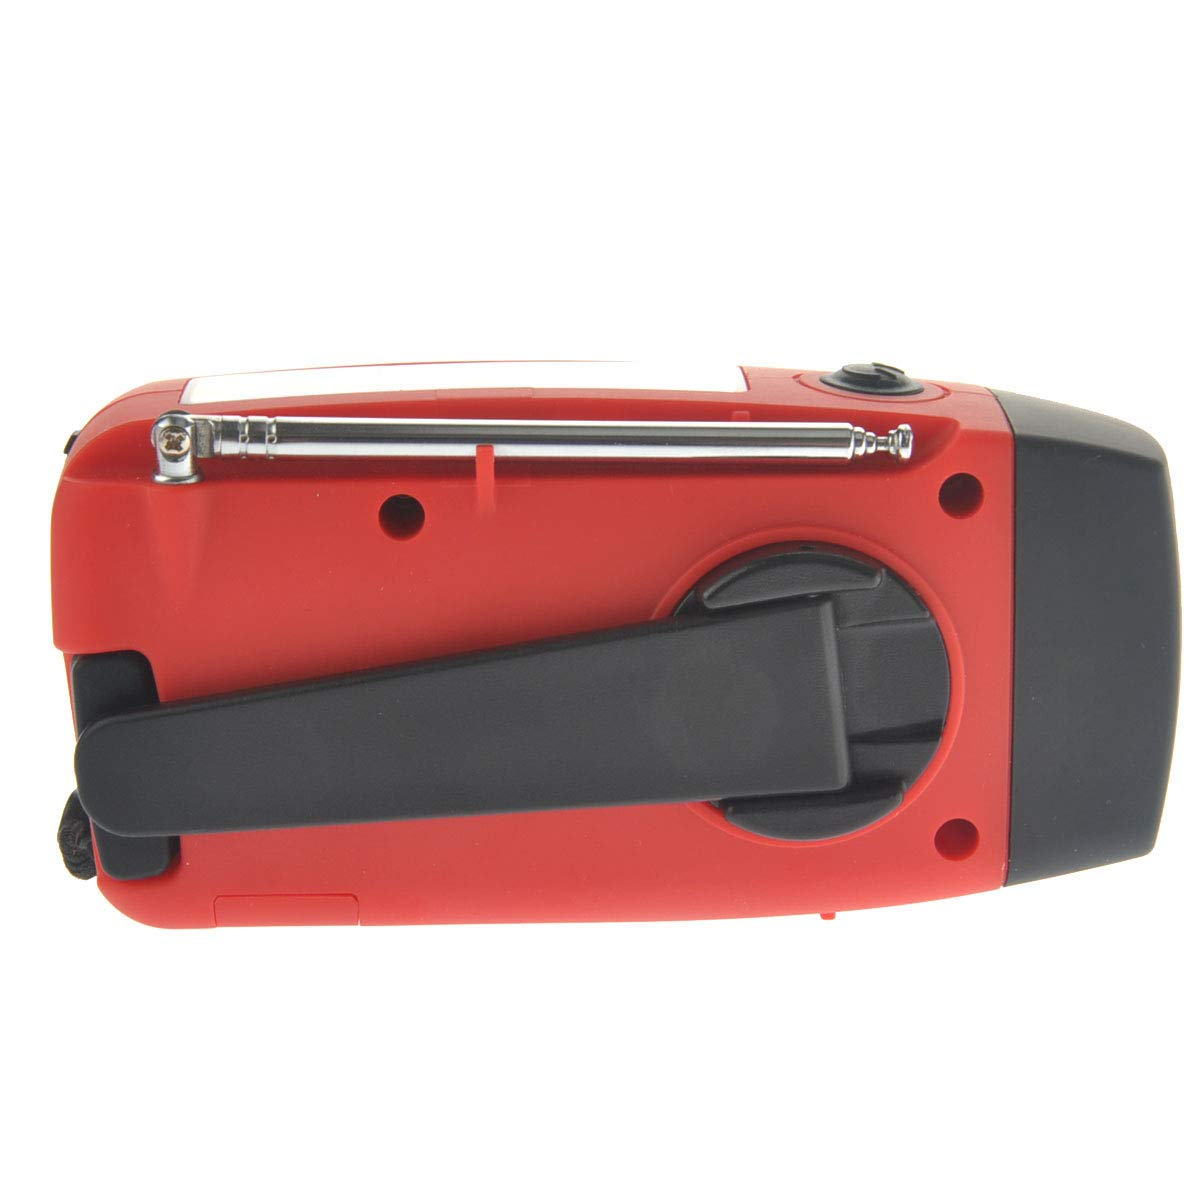 VOSAREA Emergency Solar Crank AM FM Camp Radio with LED Flashlight USB Output Port(Red) by VOSAREA (Image #7)